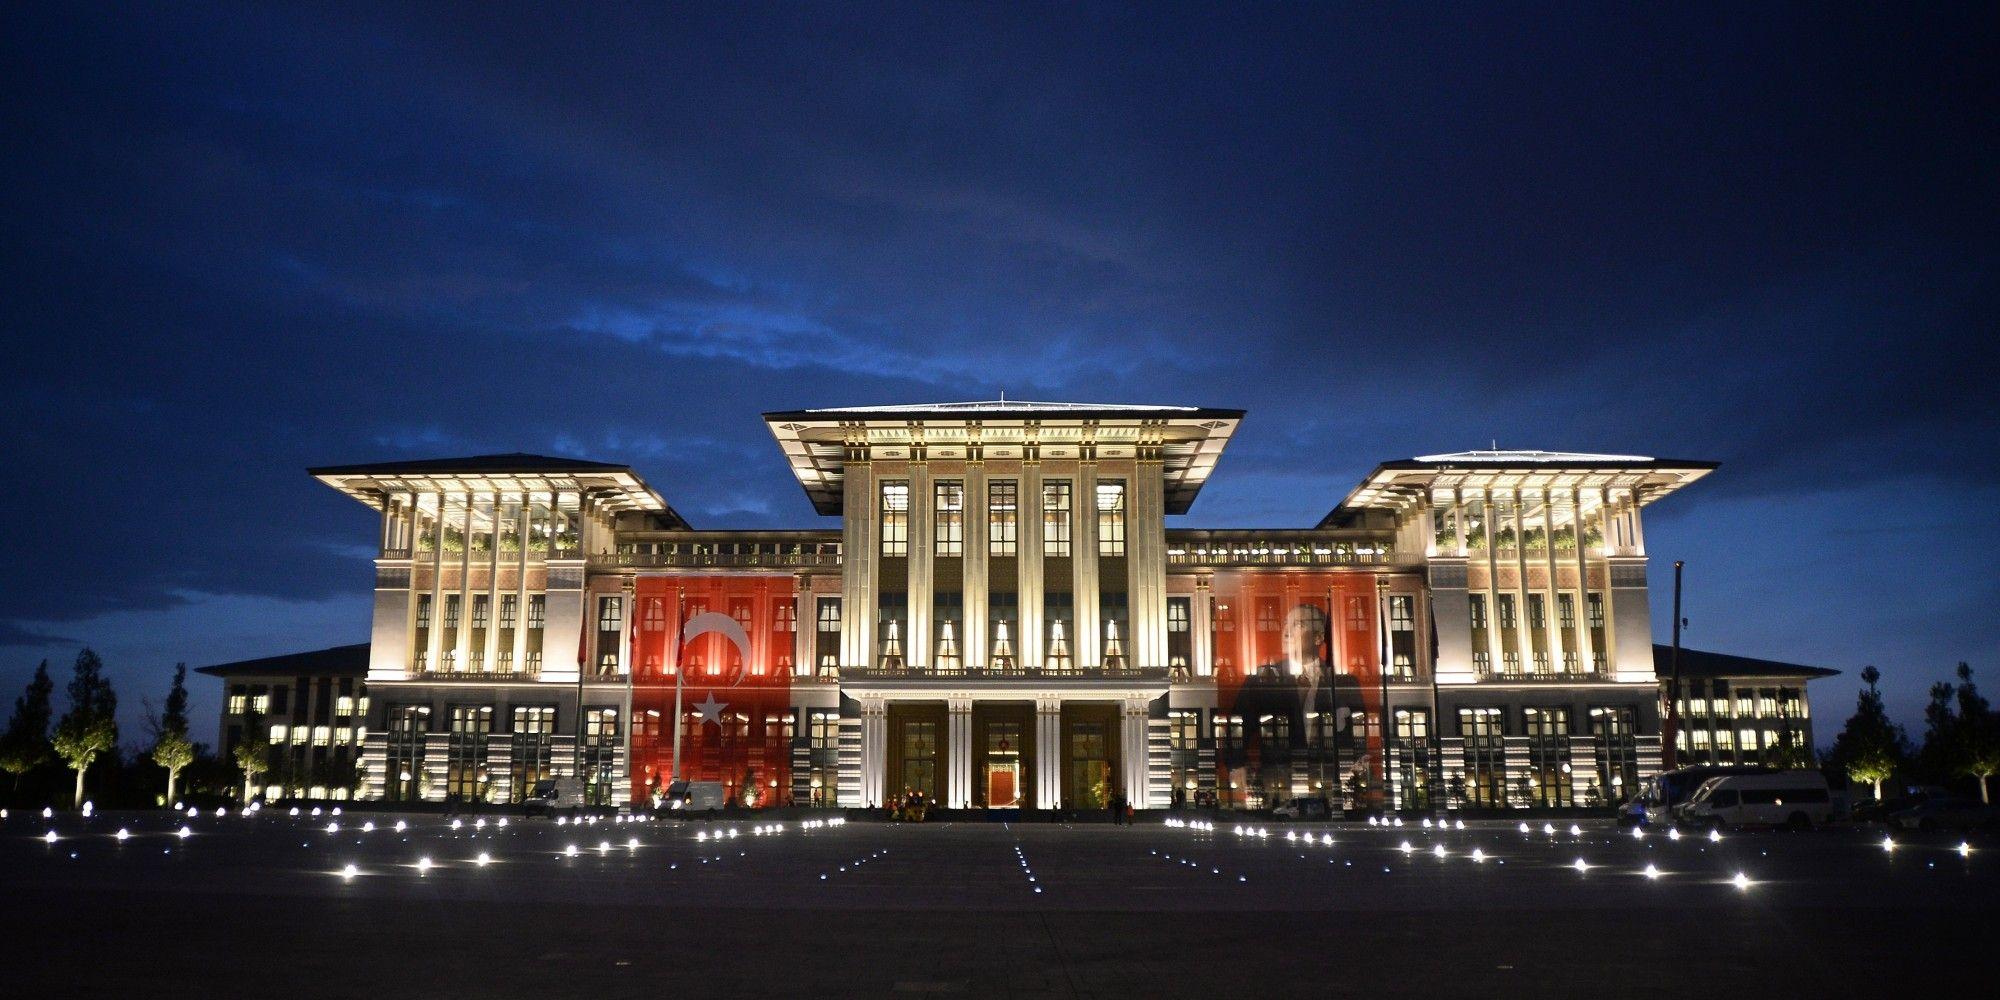 TURKEY-PRESIDENTAL PALACE